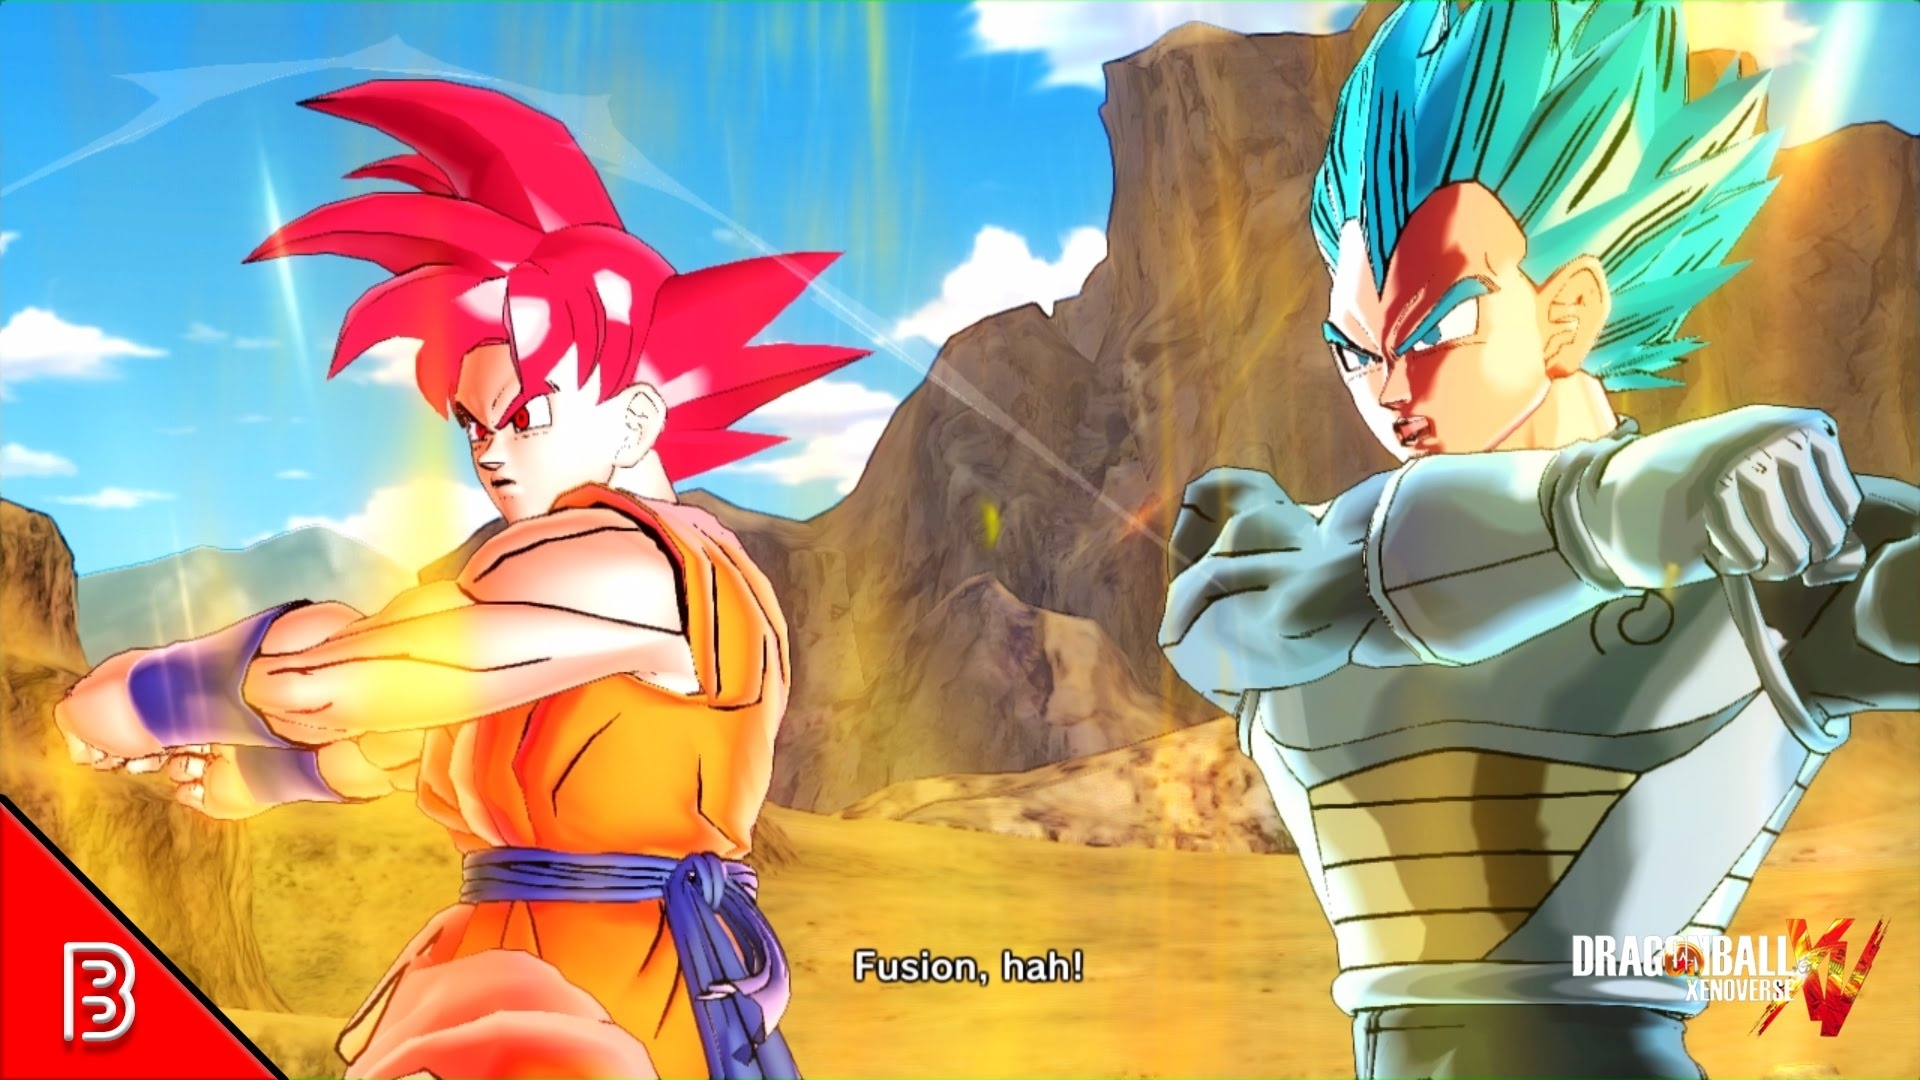 super saiyan god goku + super saiyan blue vegeta fusion